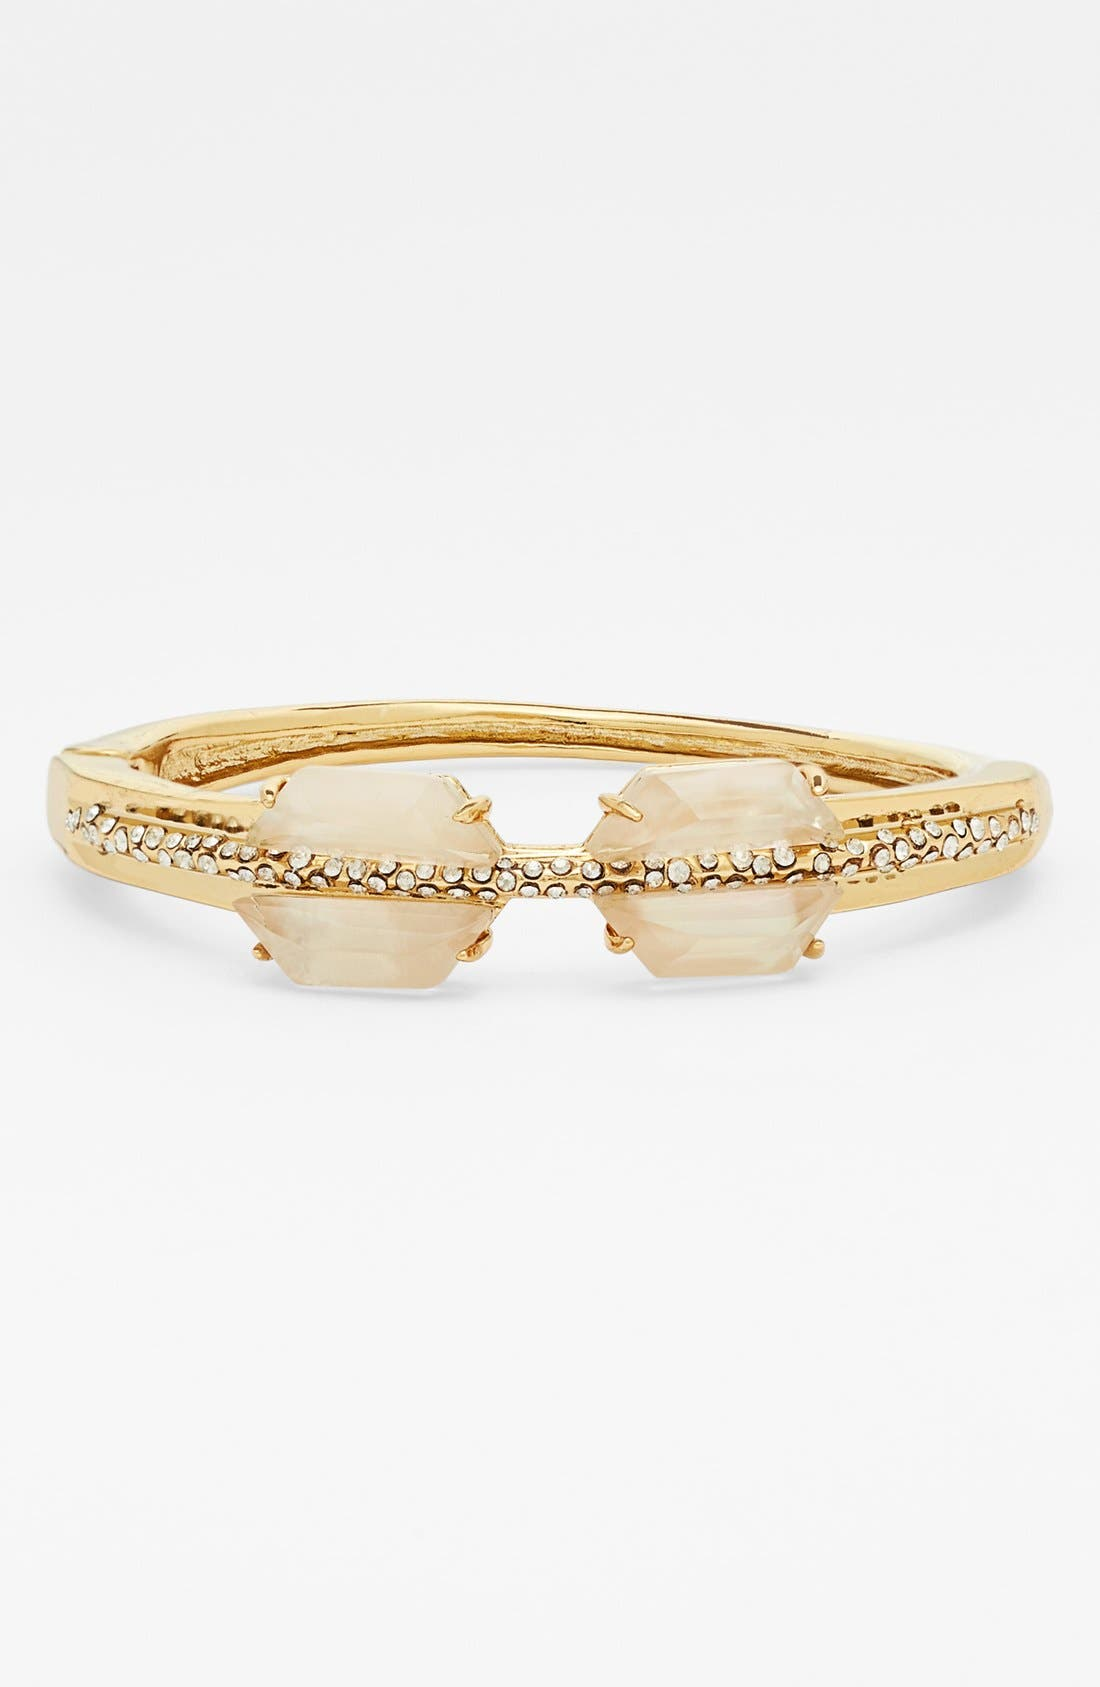 Main Image - Alexis Bittar 'Miss Havisham' Doublet Bracelet